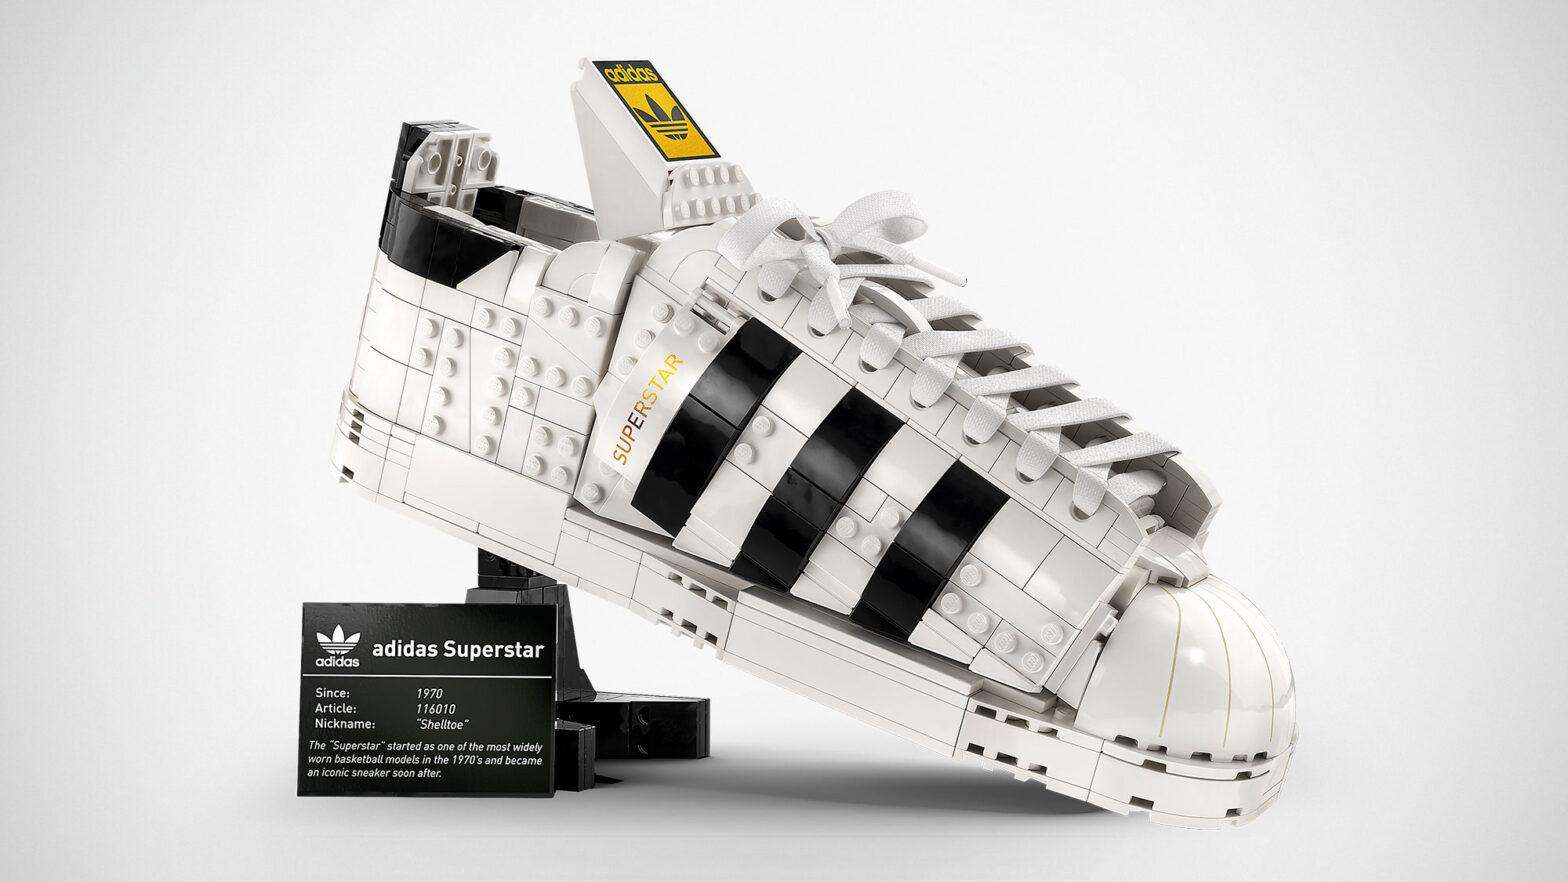 LEGO 10282 adidas Originals Superstar Sneaker